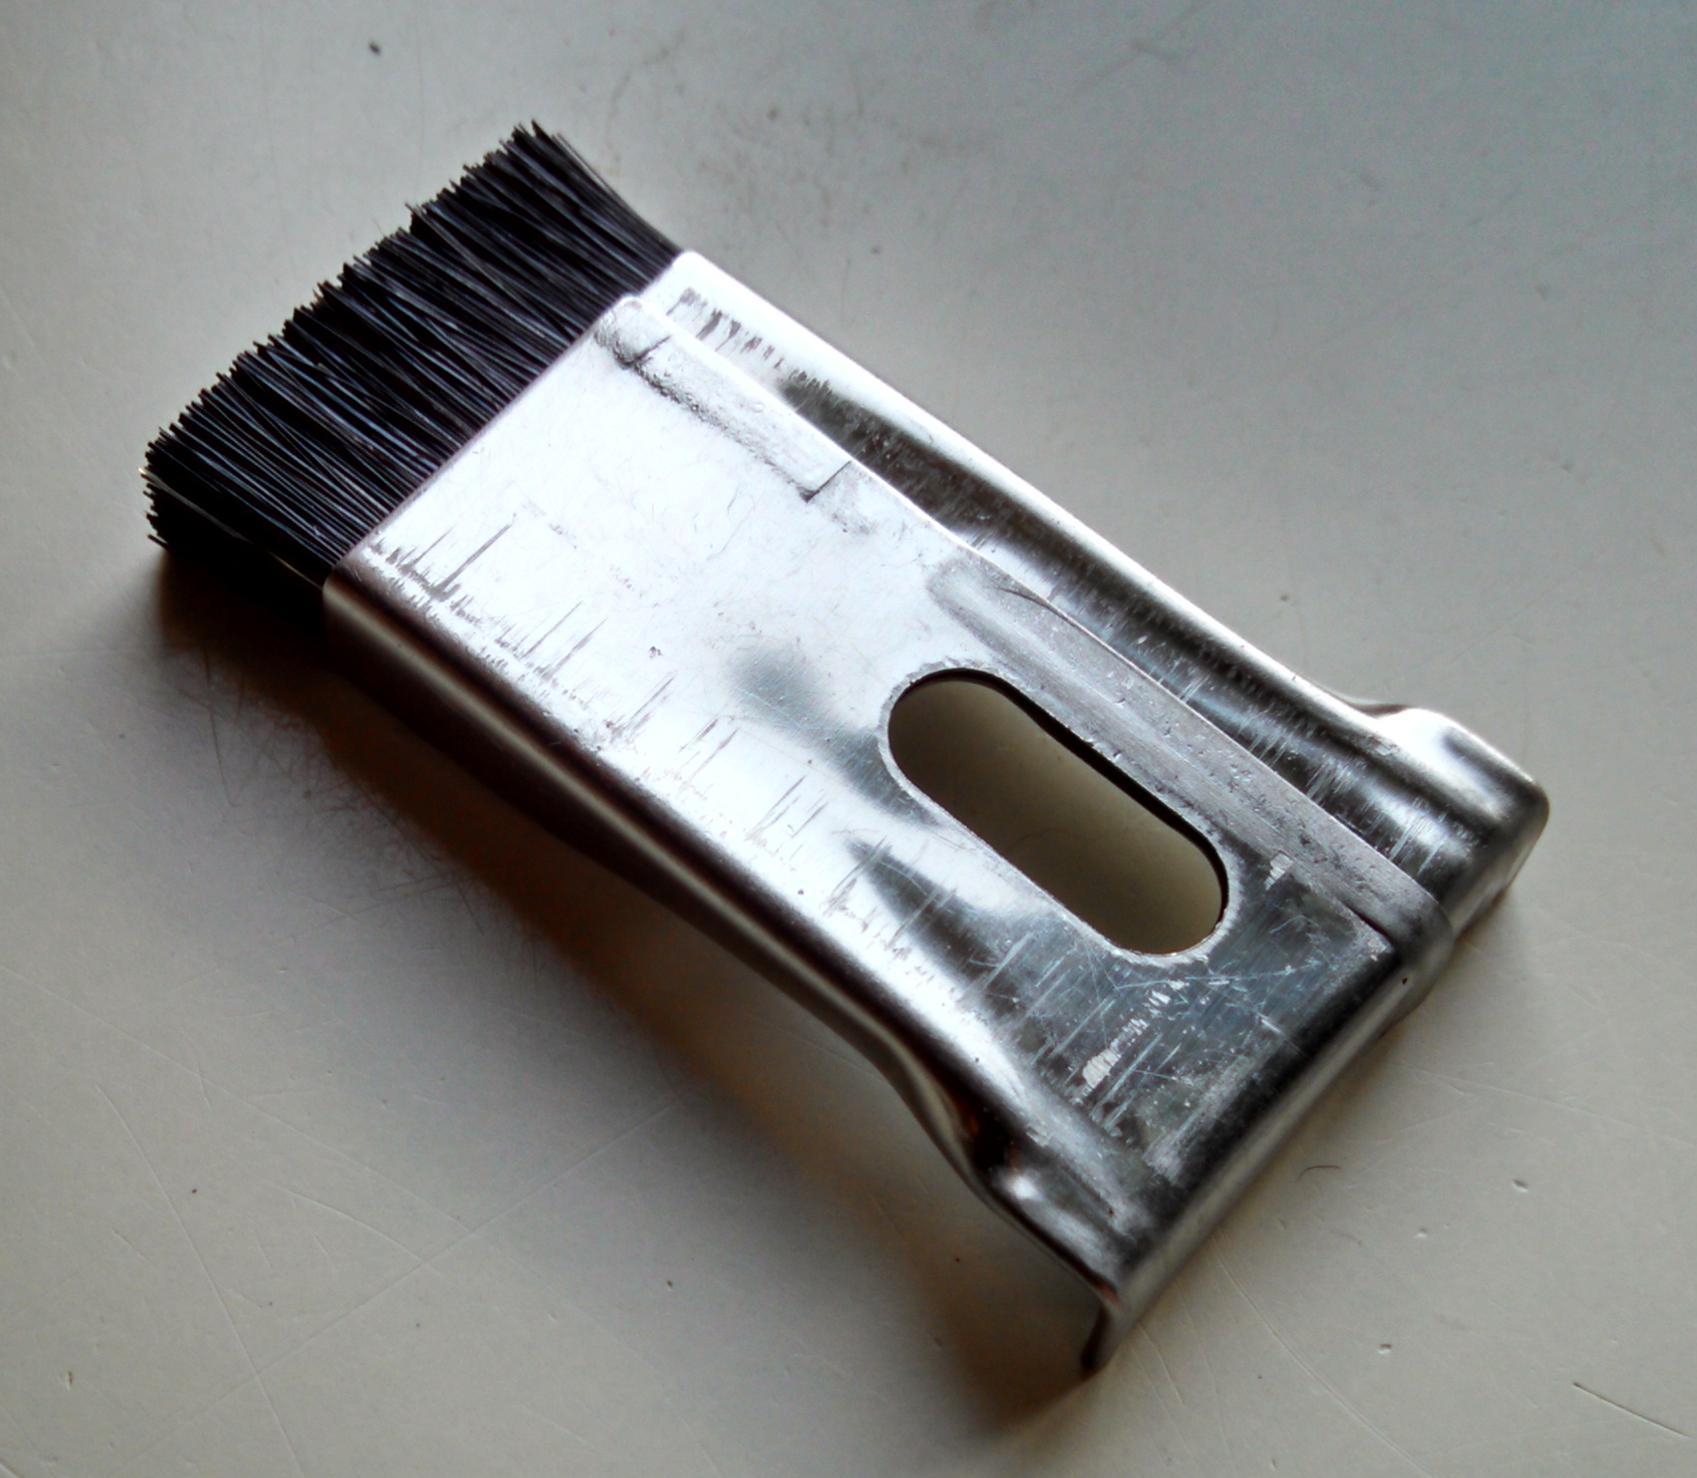 JP53 Jang Seeder Brush